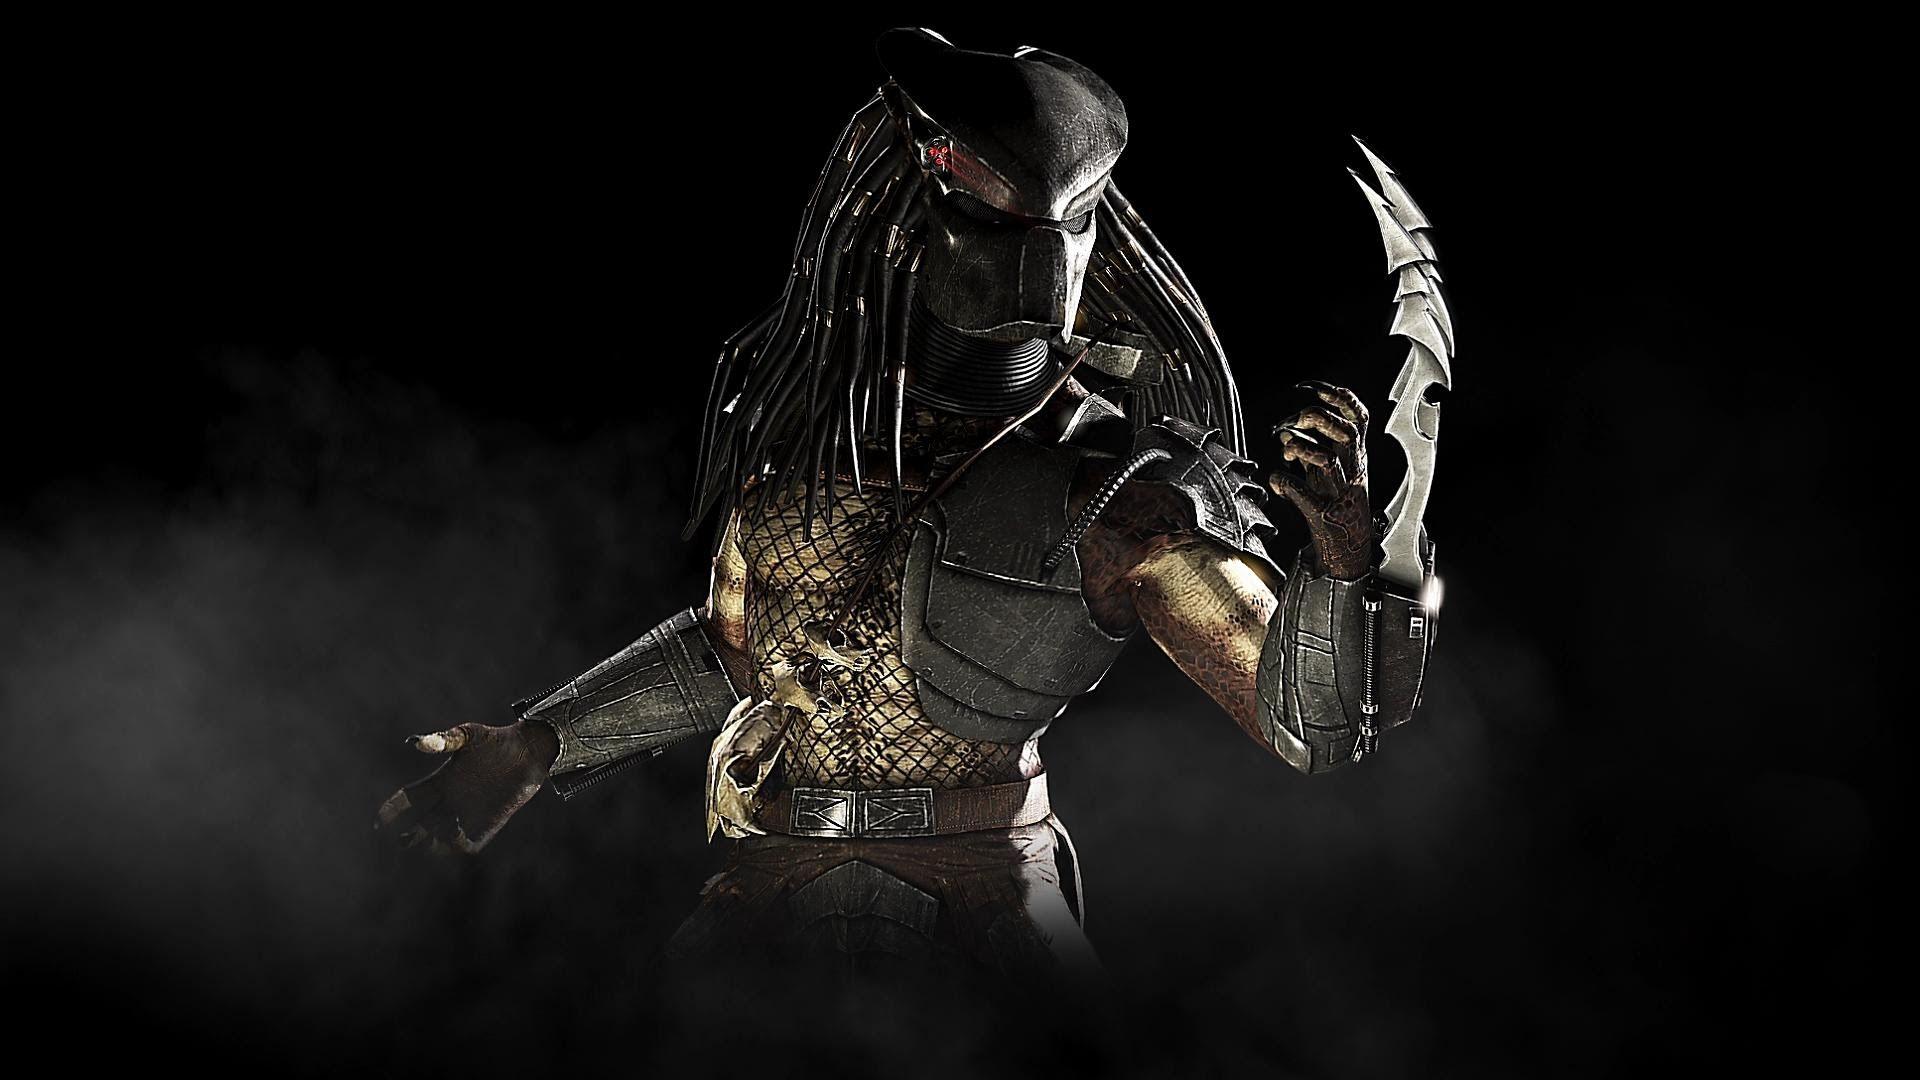 Predator Mortal Kombat X | bigphoto | Mortal kombat x